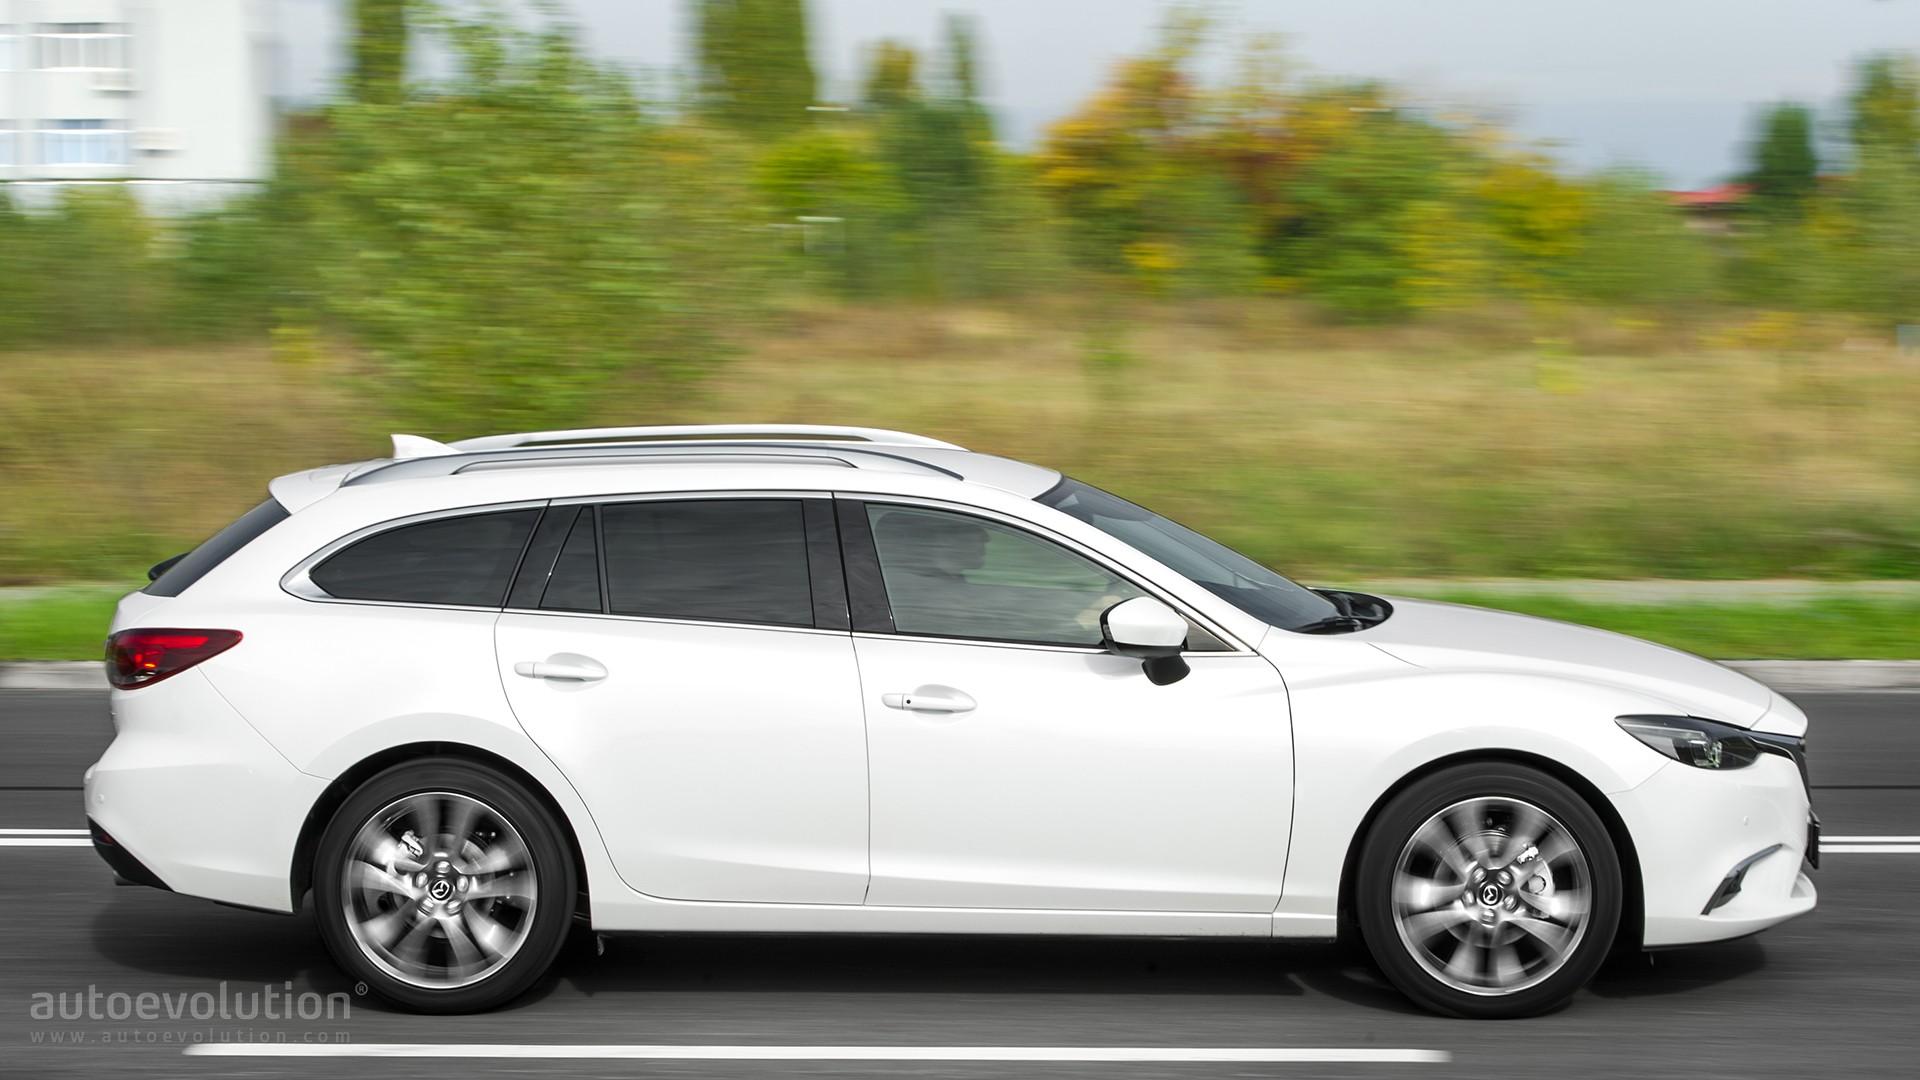 Excellent 2016 Mazda6 Wagon 22 SkyactivD Review  Autoevolution